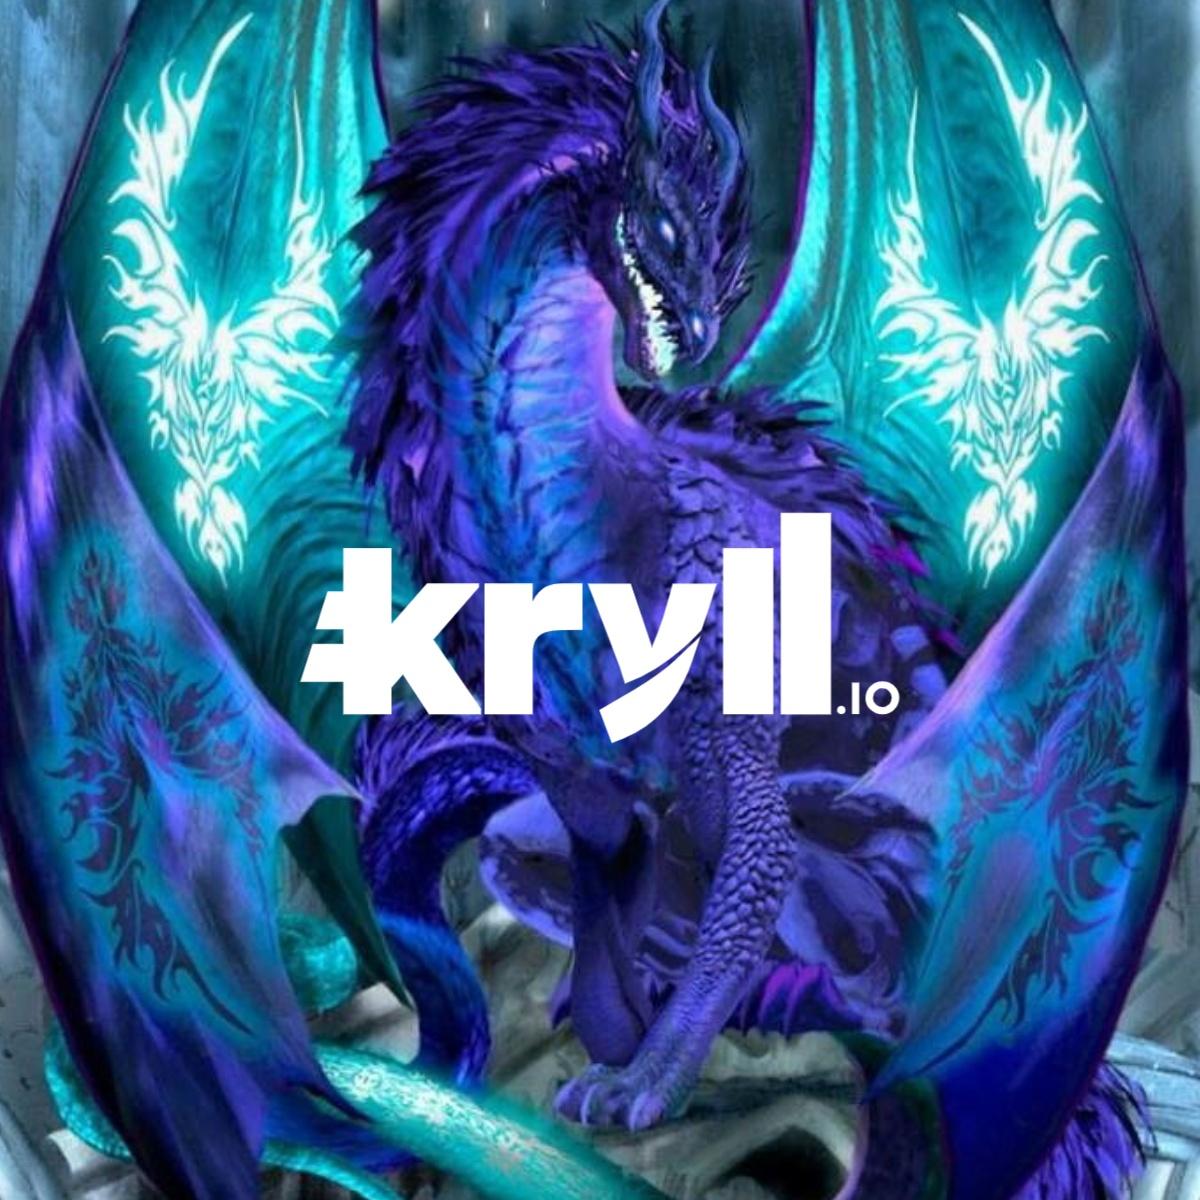 DRAGON Kryll strategy poster